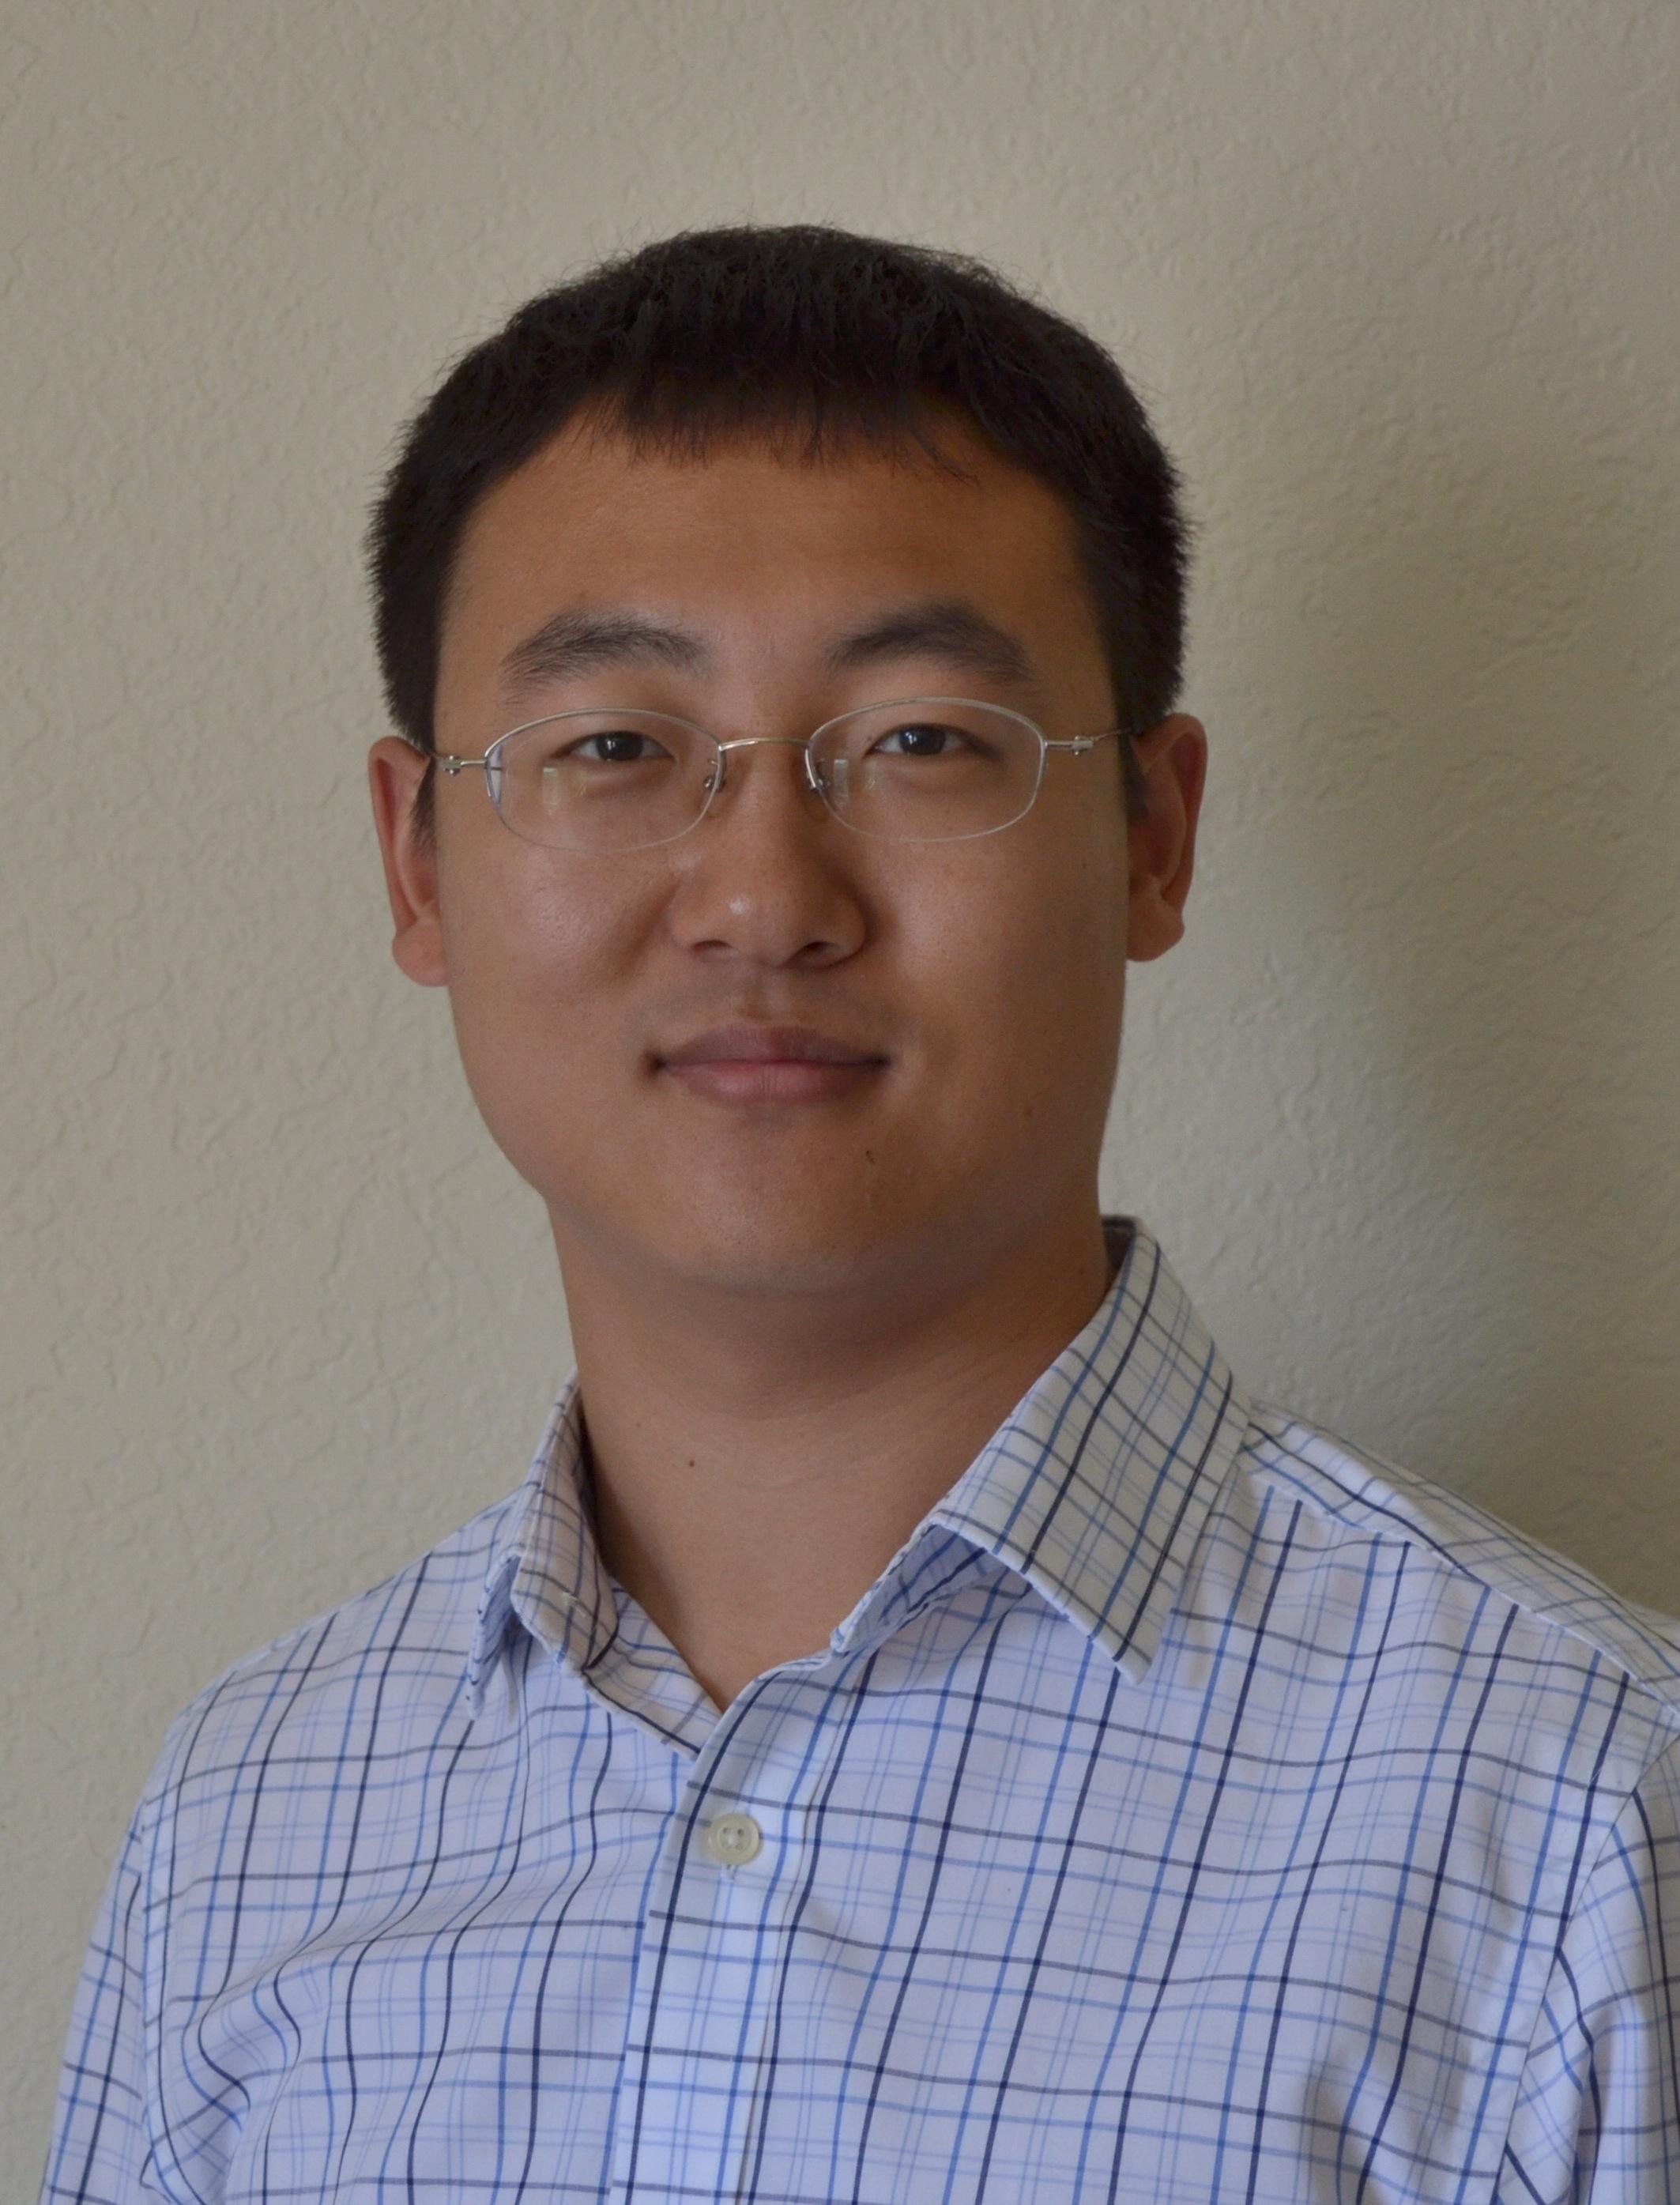 https://d2vsp3qmody48p.cloudfront.net/wp-content/uploads/2014/09/Zhang.jpg